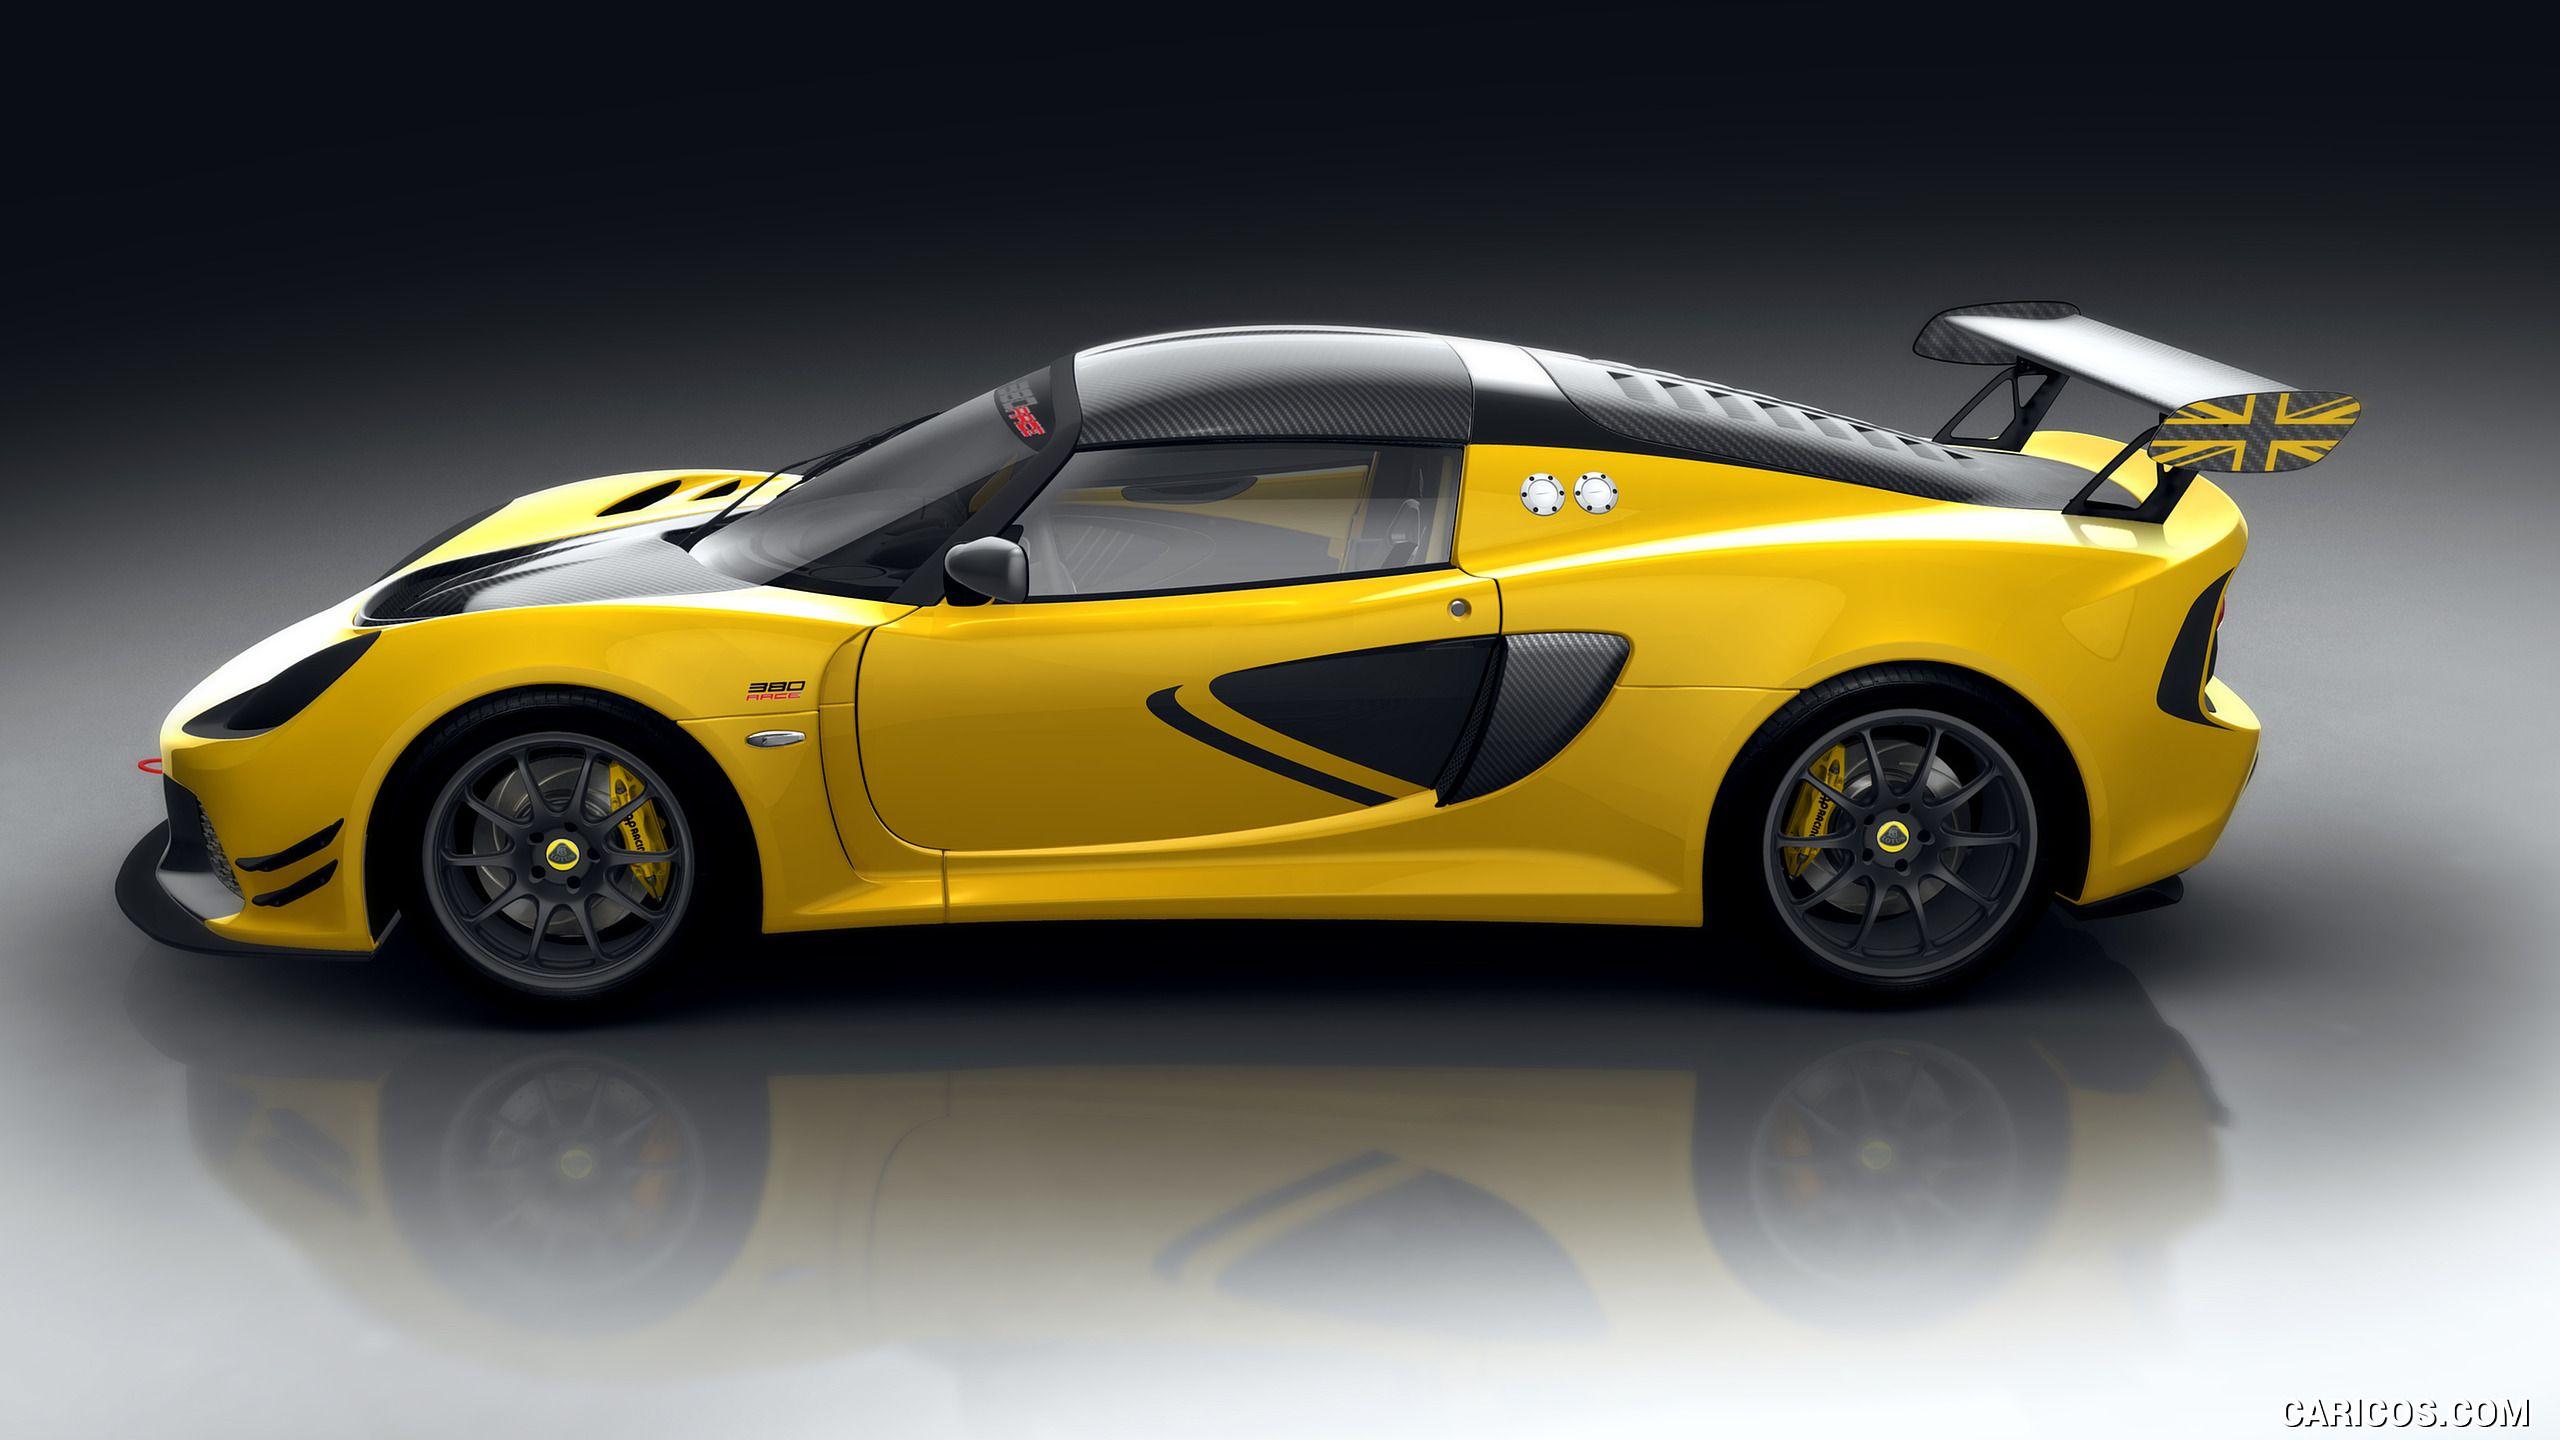 2017 Lotus Exige Race 380 Wallpaper Lotus Exige Lotus Car